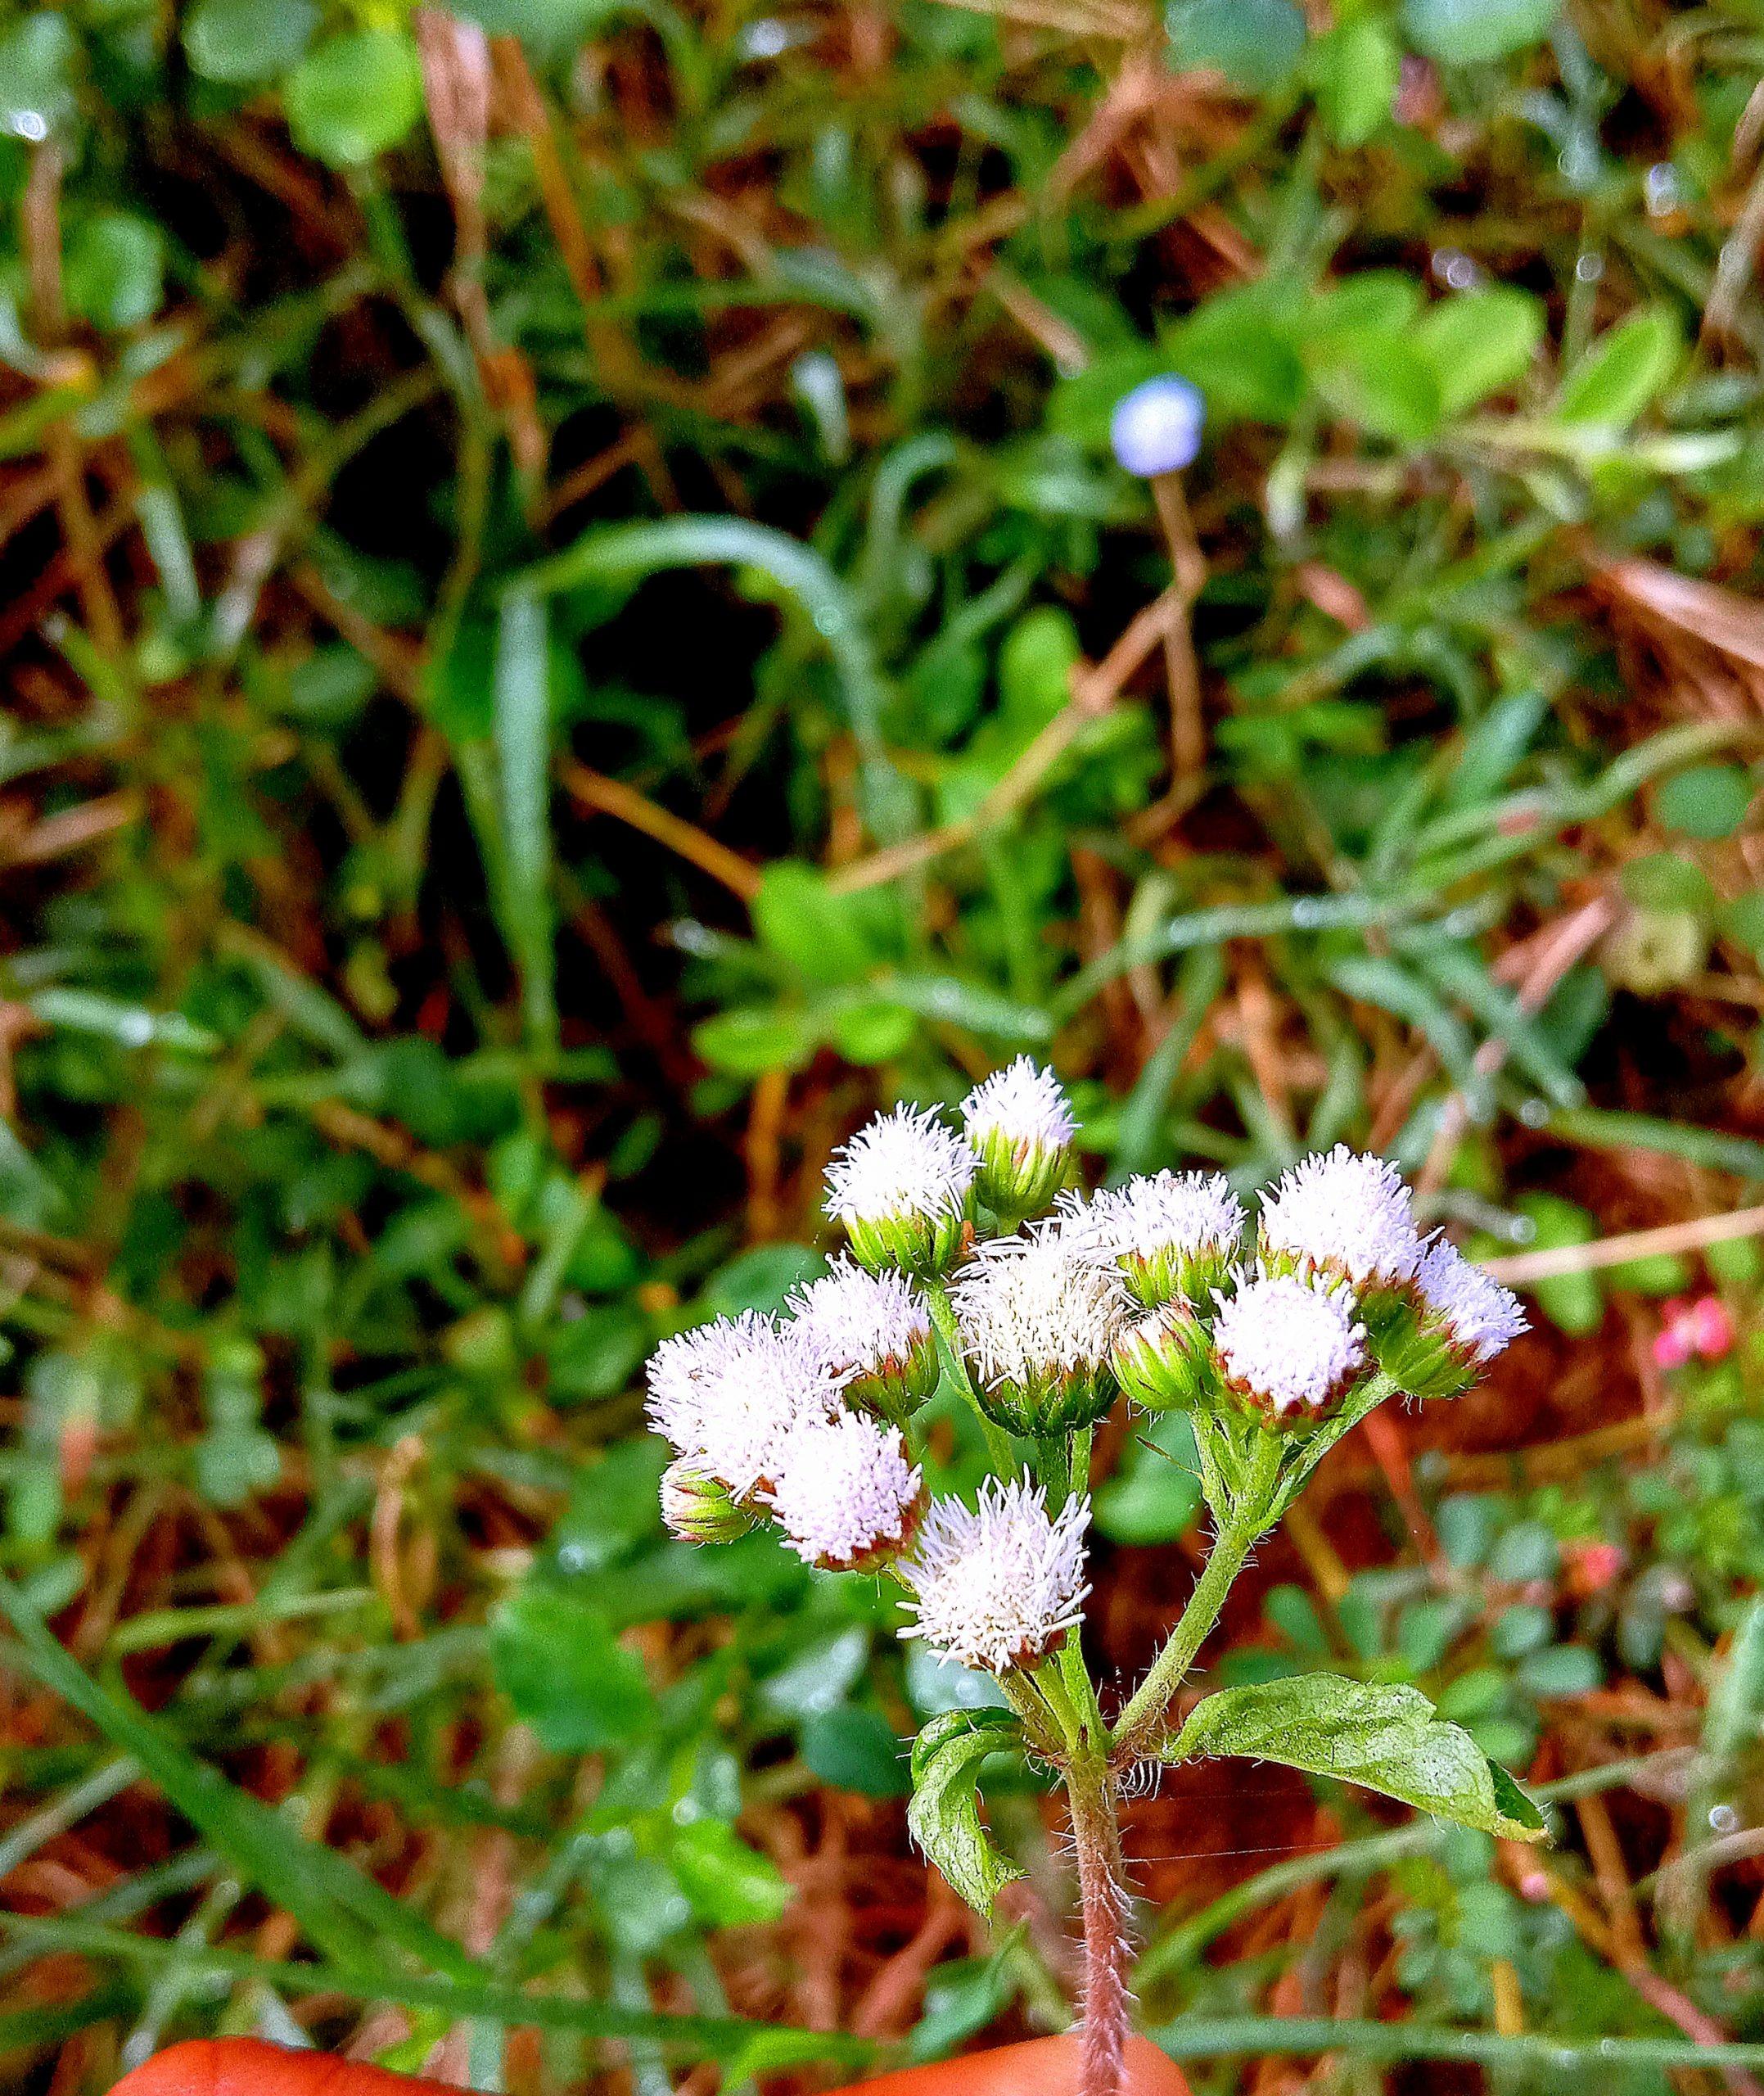 Tiny White Lavender Flowers